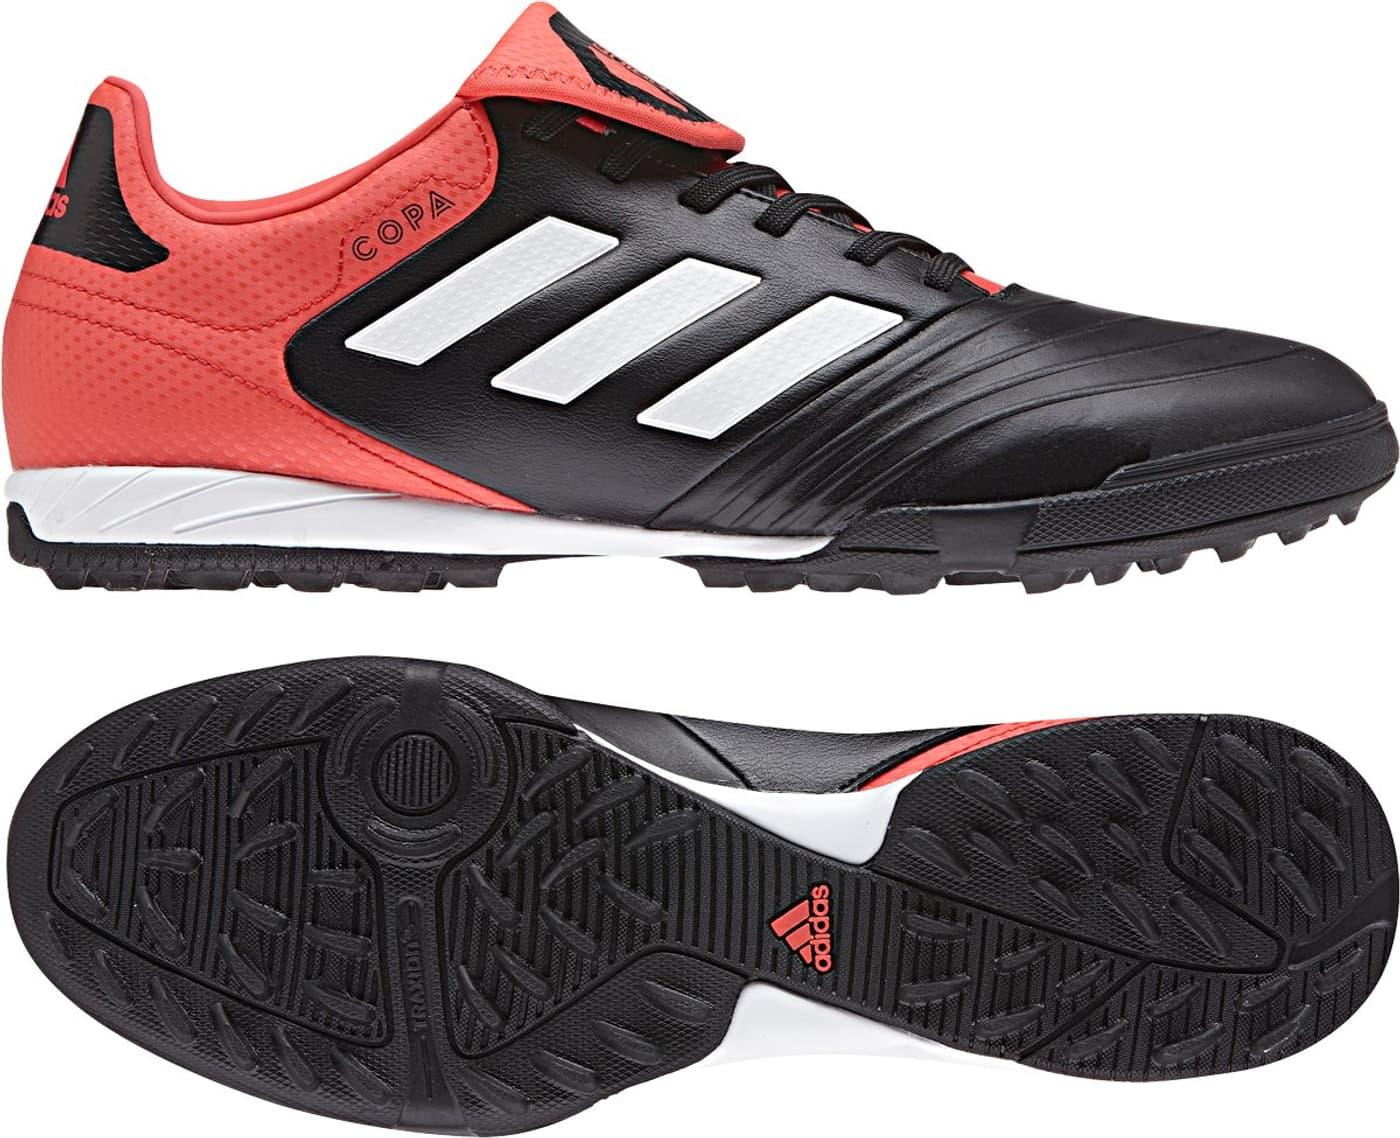 Tango Tf Pour Adidas 3 Chaussures De Copa 18 Football HommeMigros YfgI76ybv